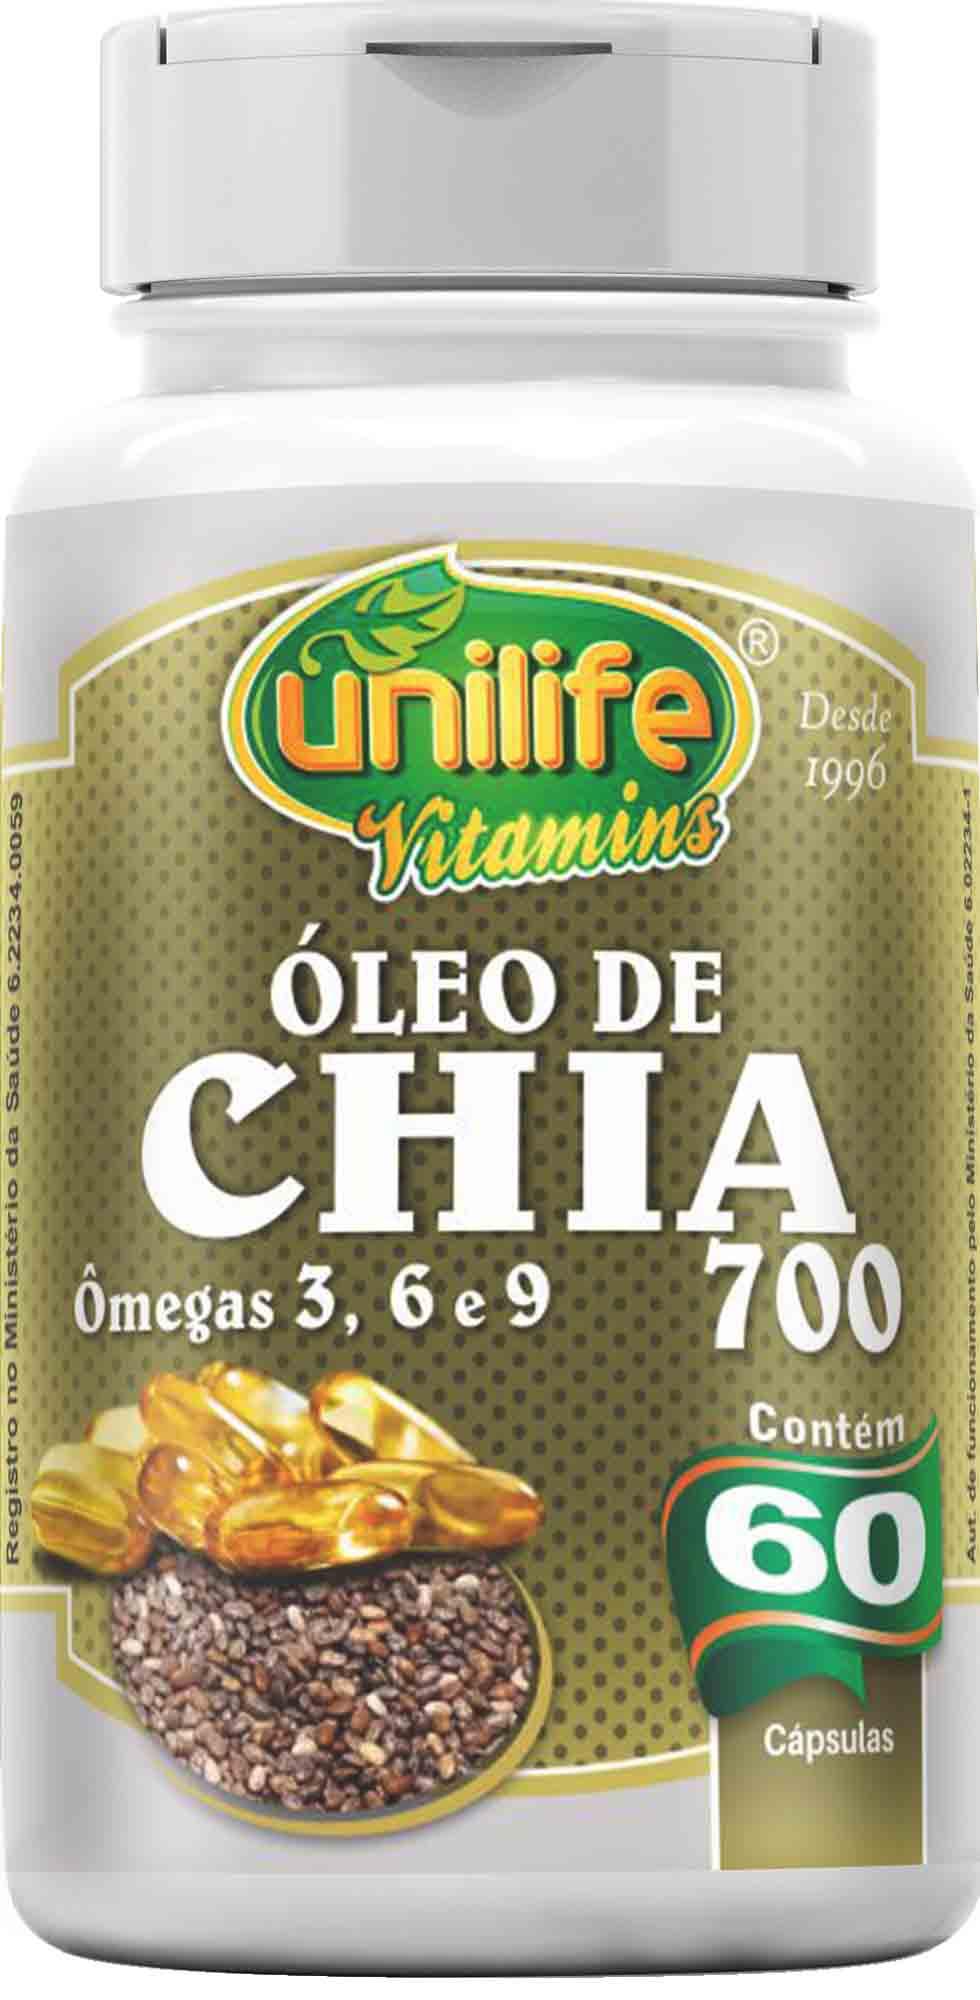 UNI OLEO DE CHIA 700 MG - 60 CAPS Unilife